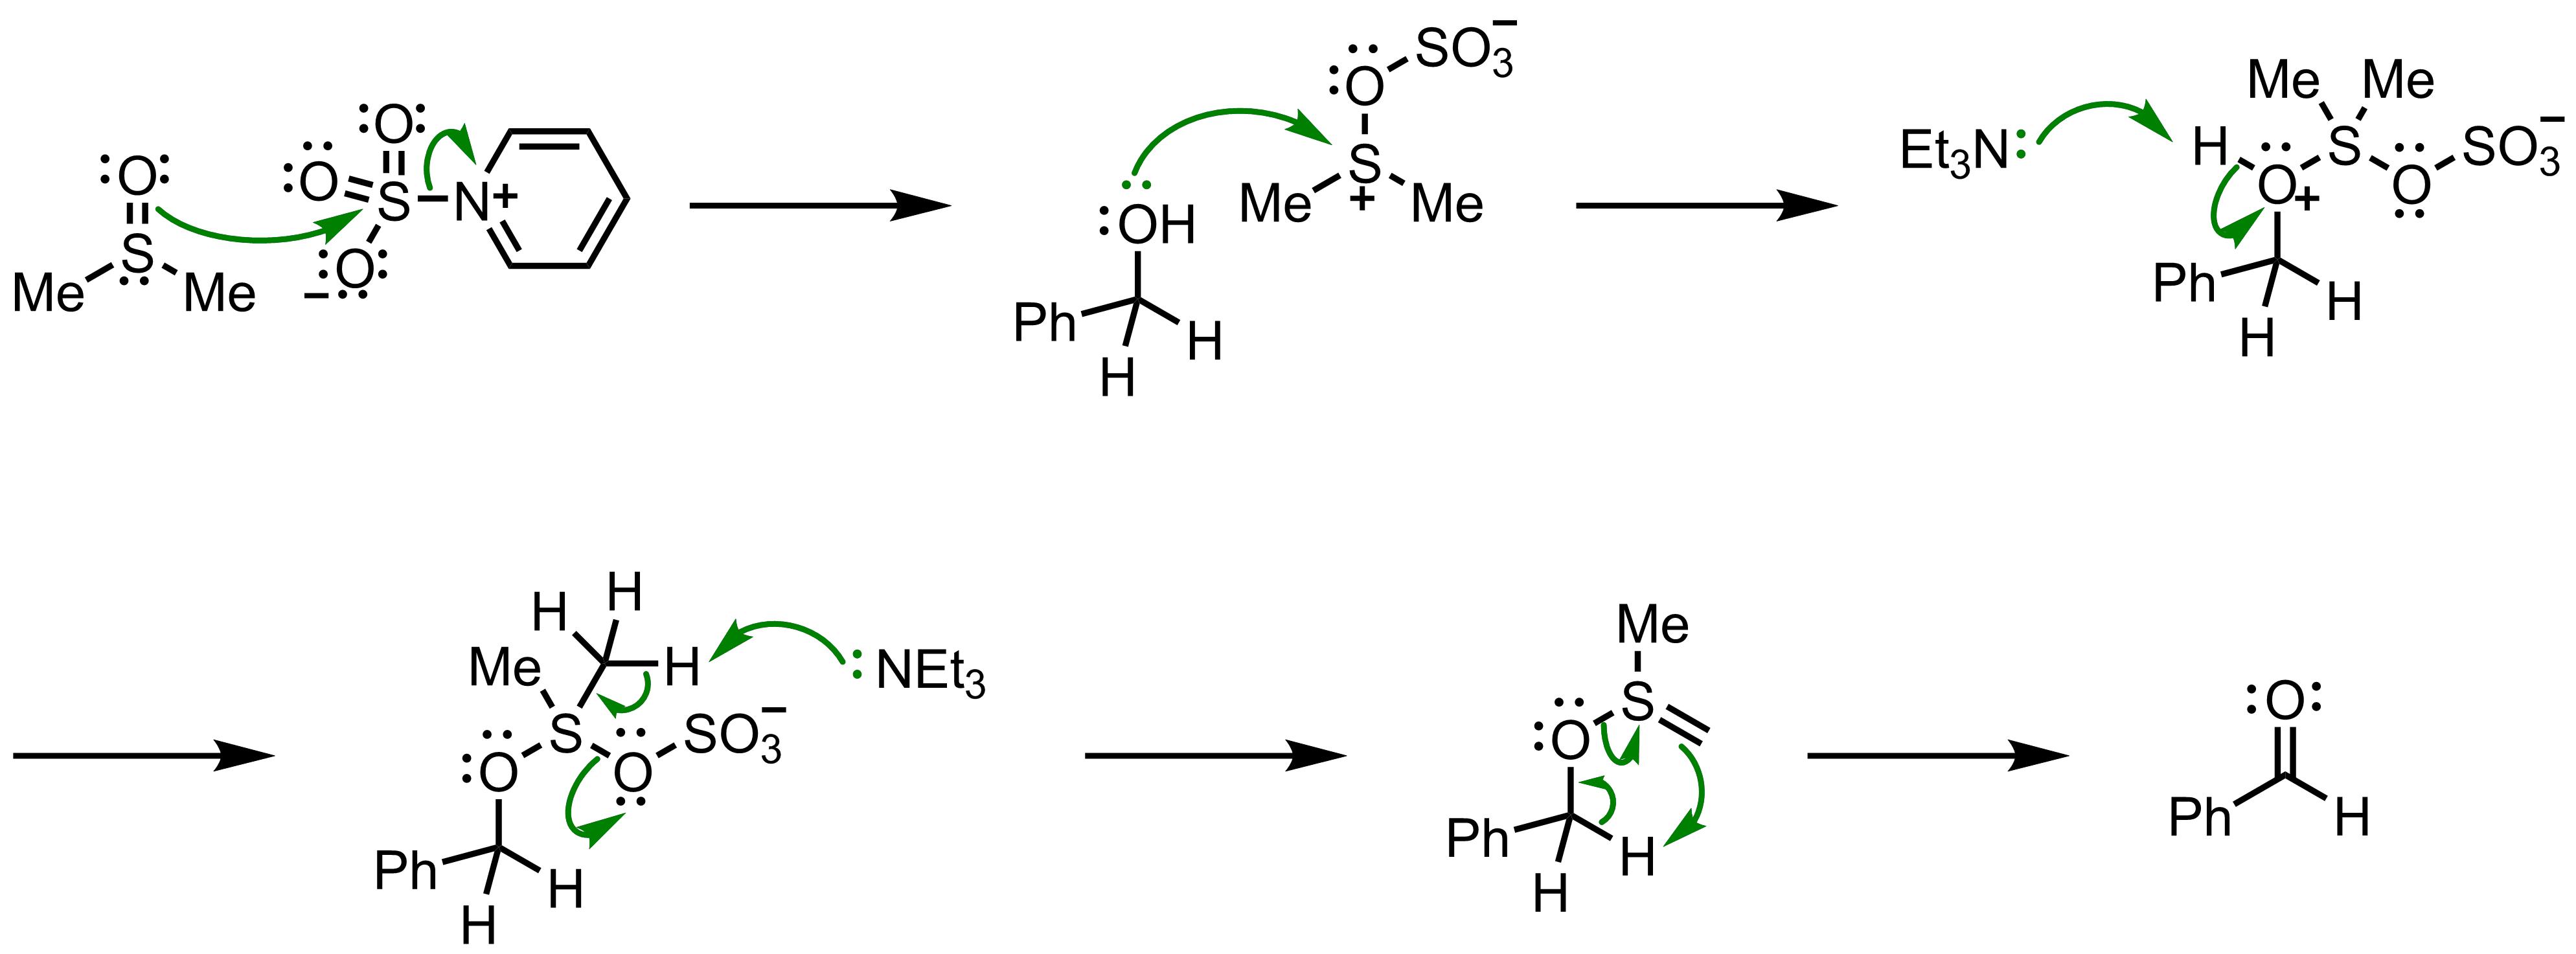 Mechanism of the Parikh-Doering Oxidation